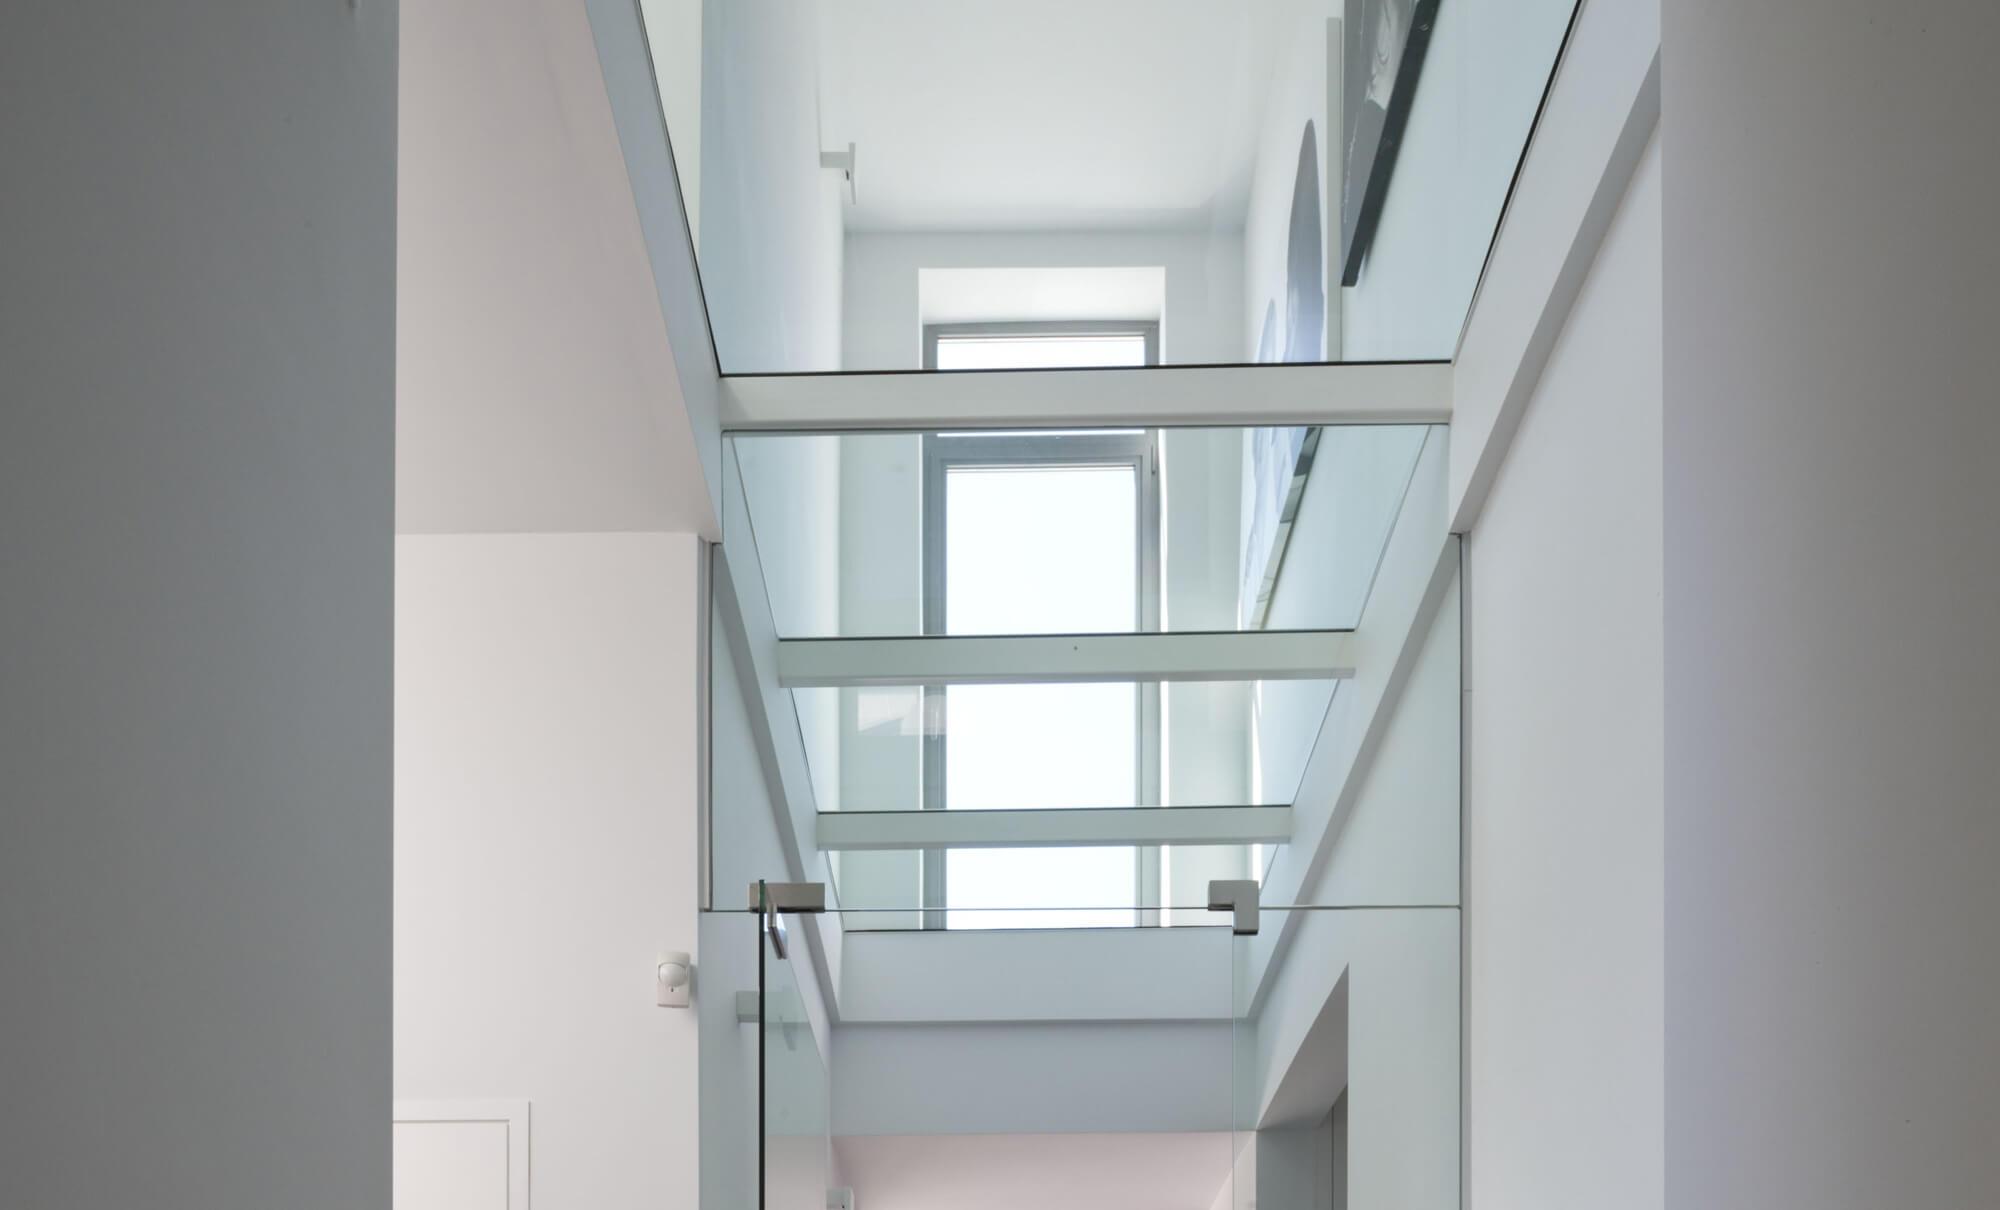 Pglas - Glazen vloer in helder gelaagd glas